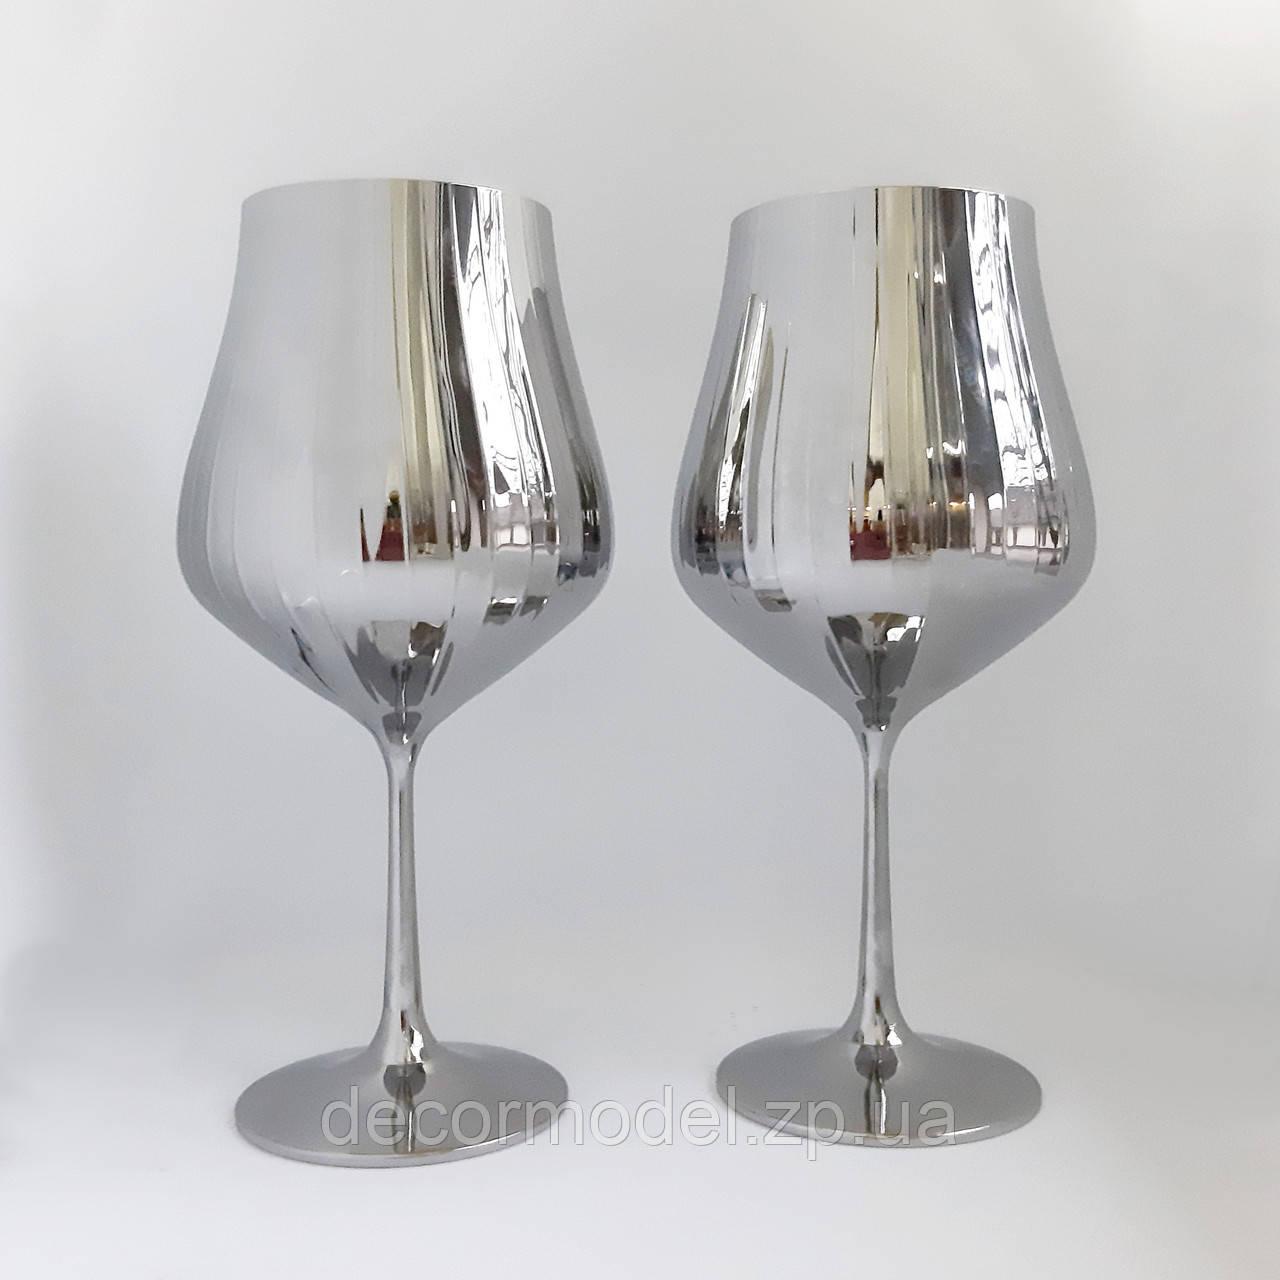 Набор бокалов для вина Bohemia Tulipa optic 600 мл хром